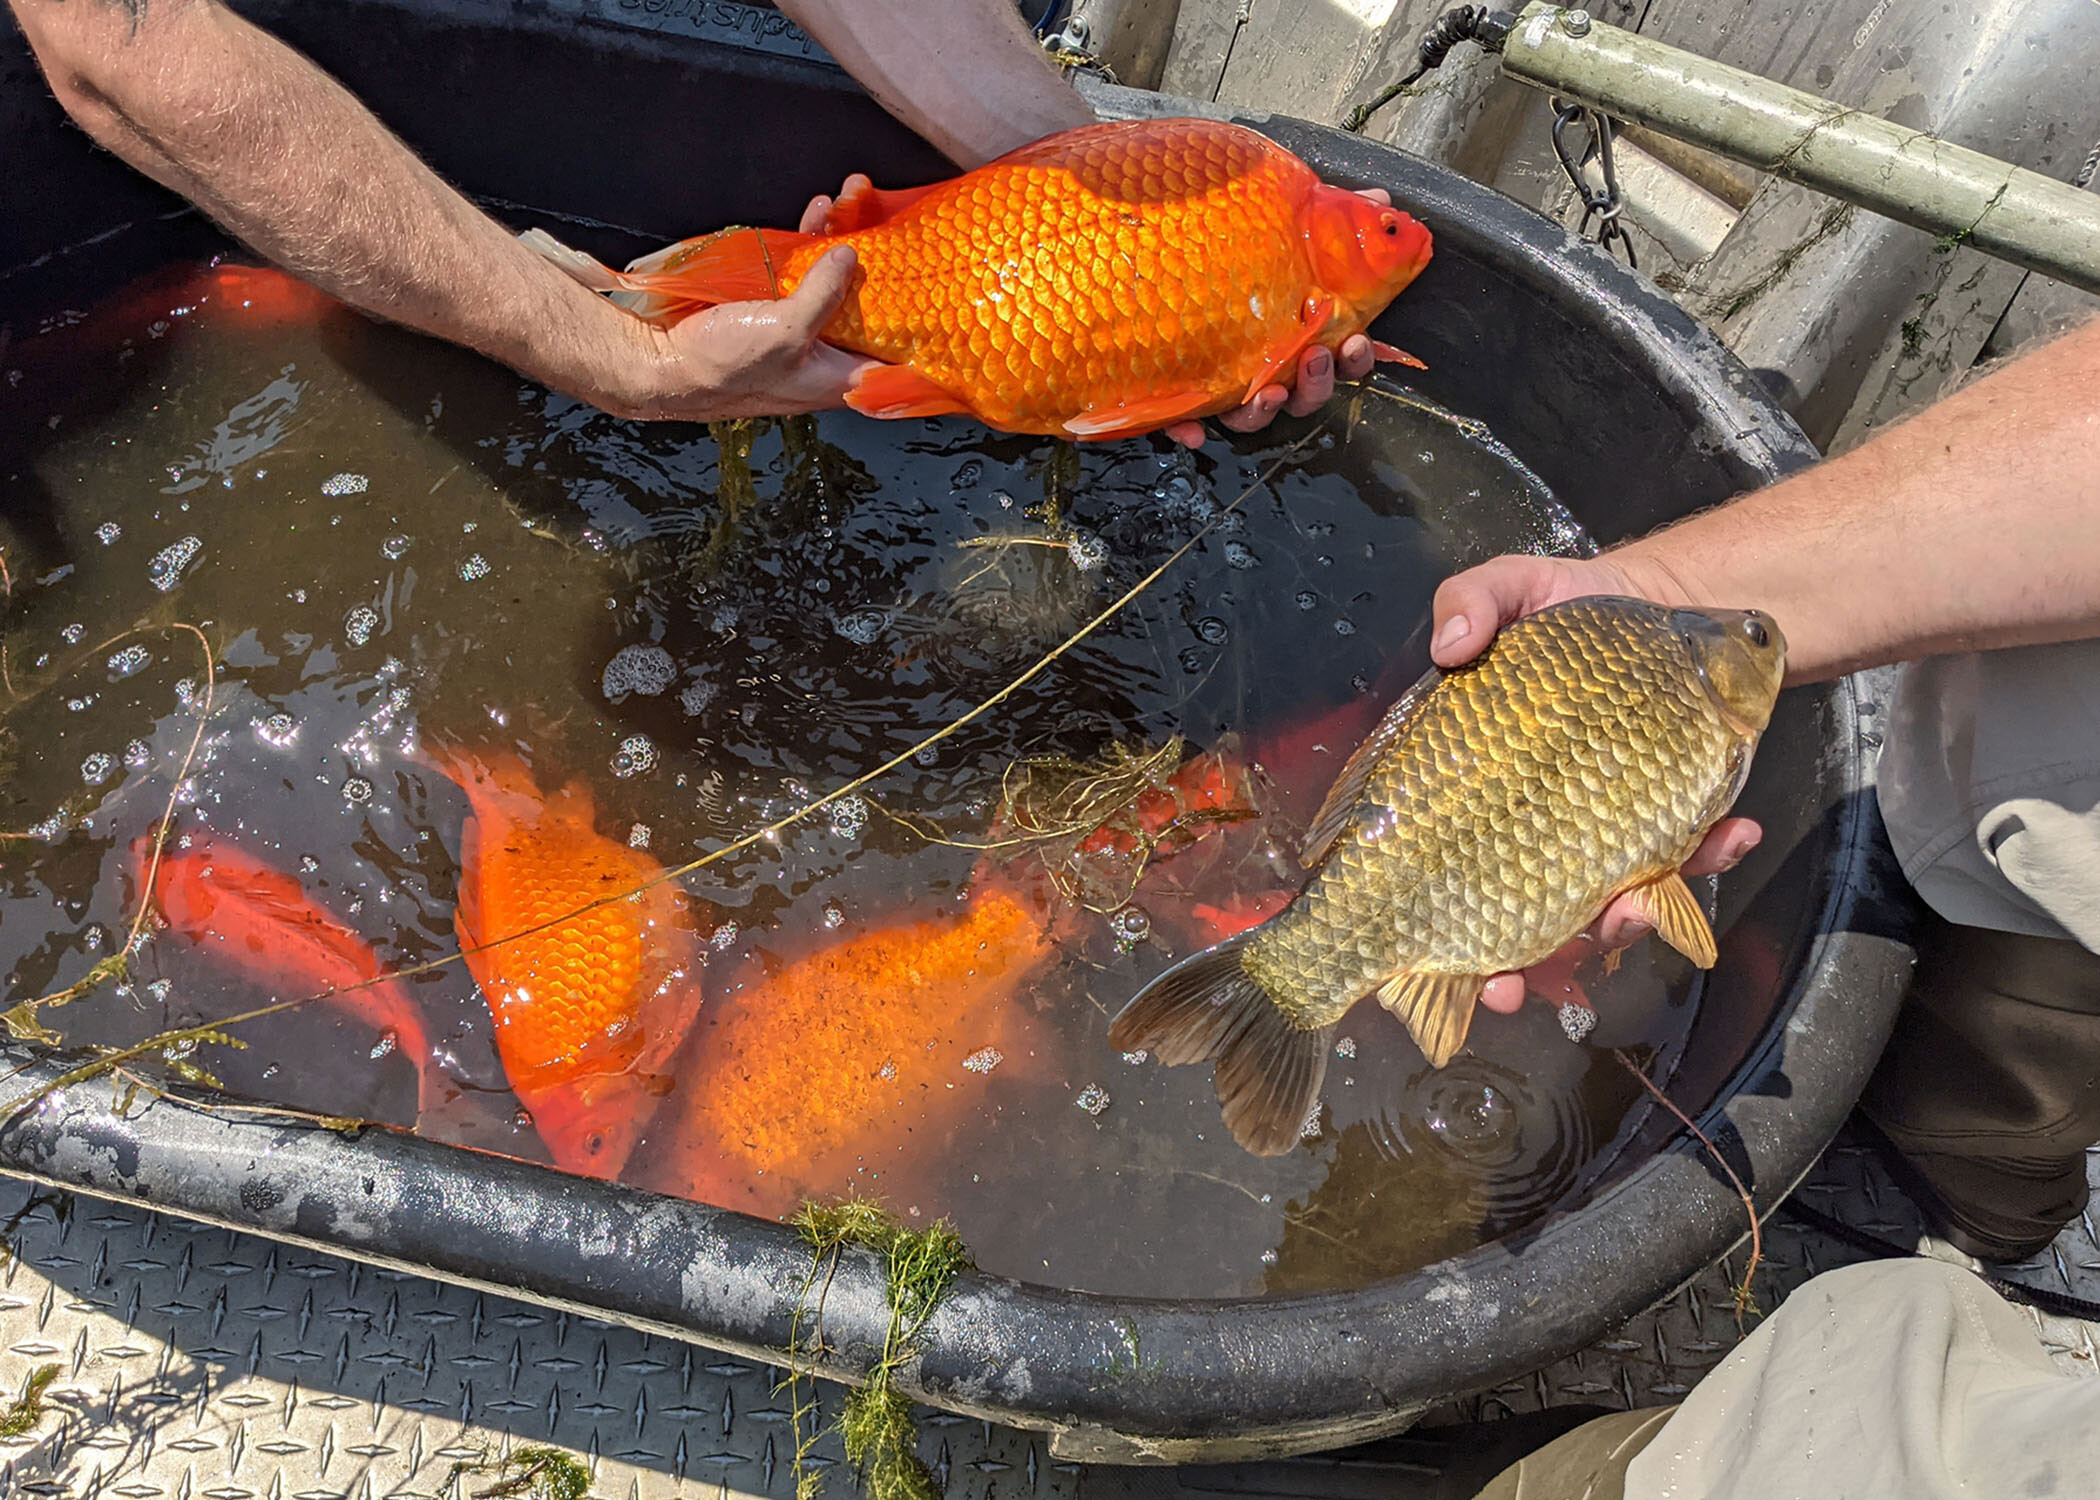 Invasive, football-size goldfish found in a Minnesota lake